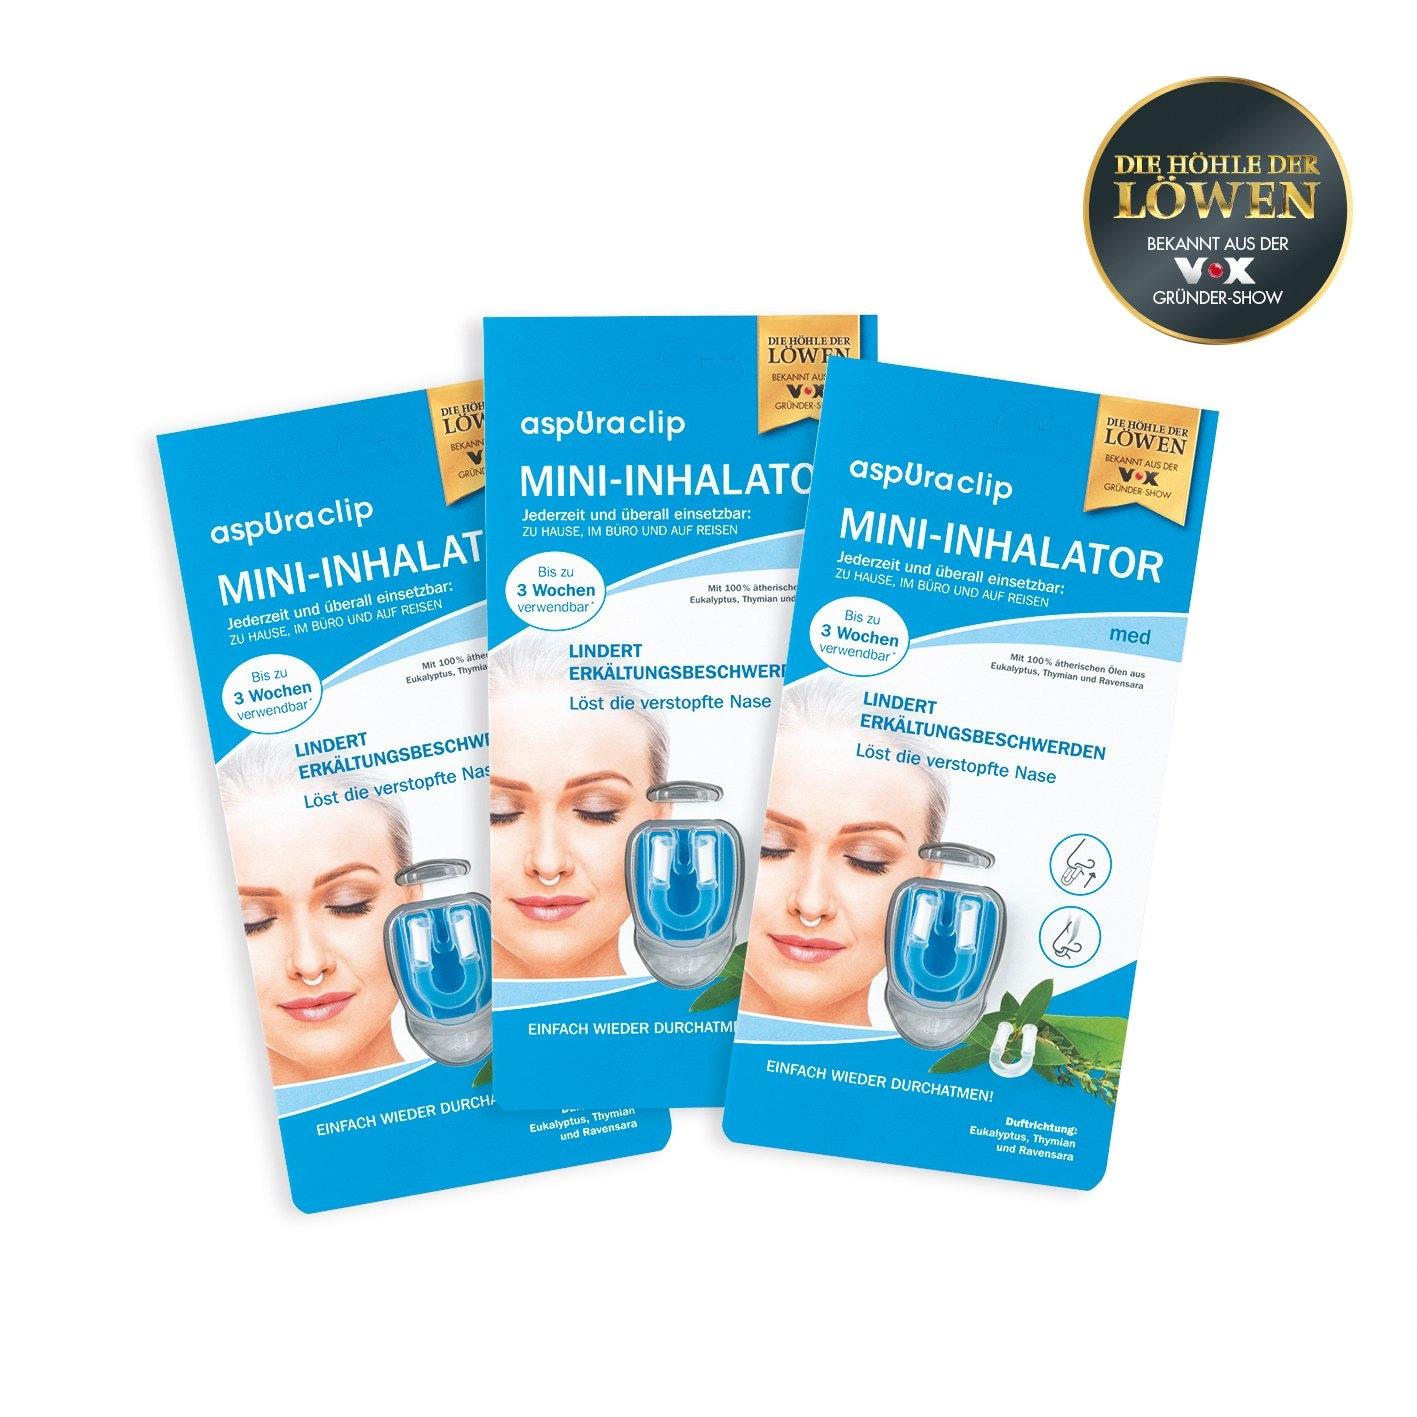 aspUraclip Mini-Inhalator 3x med